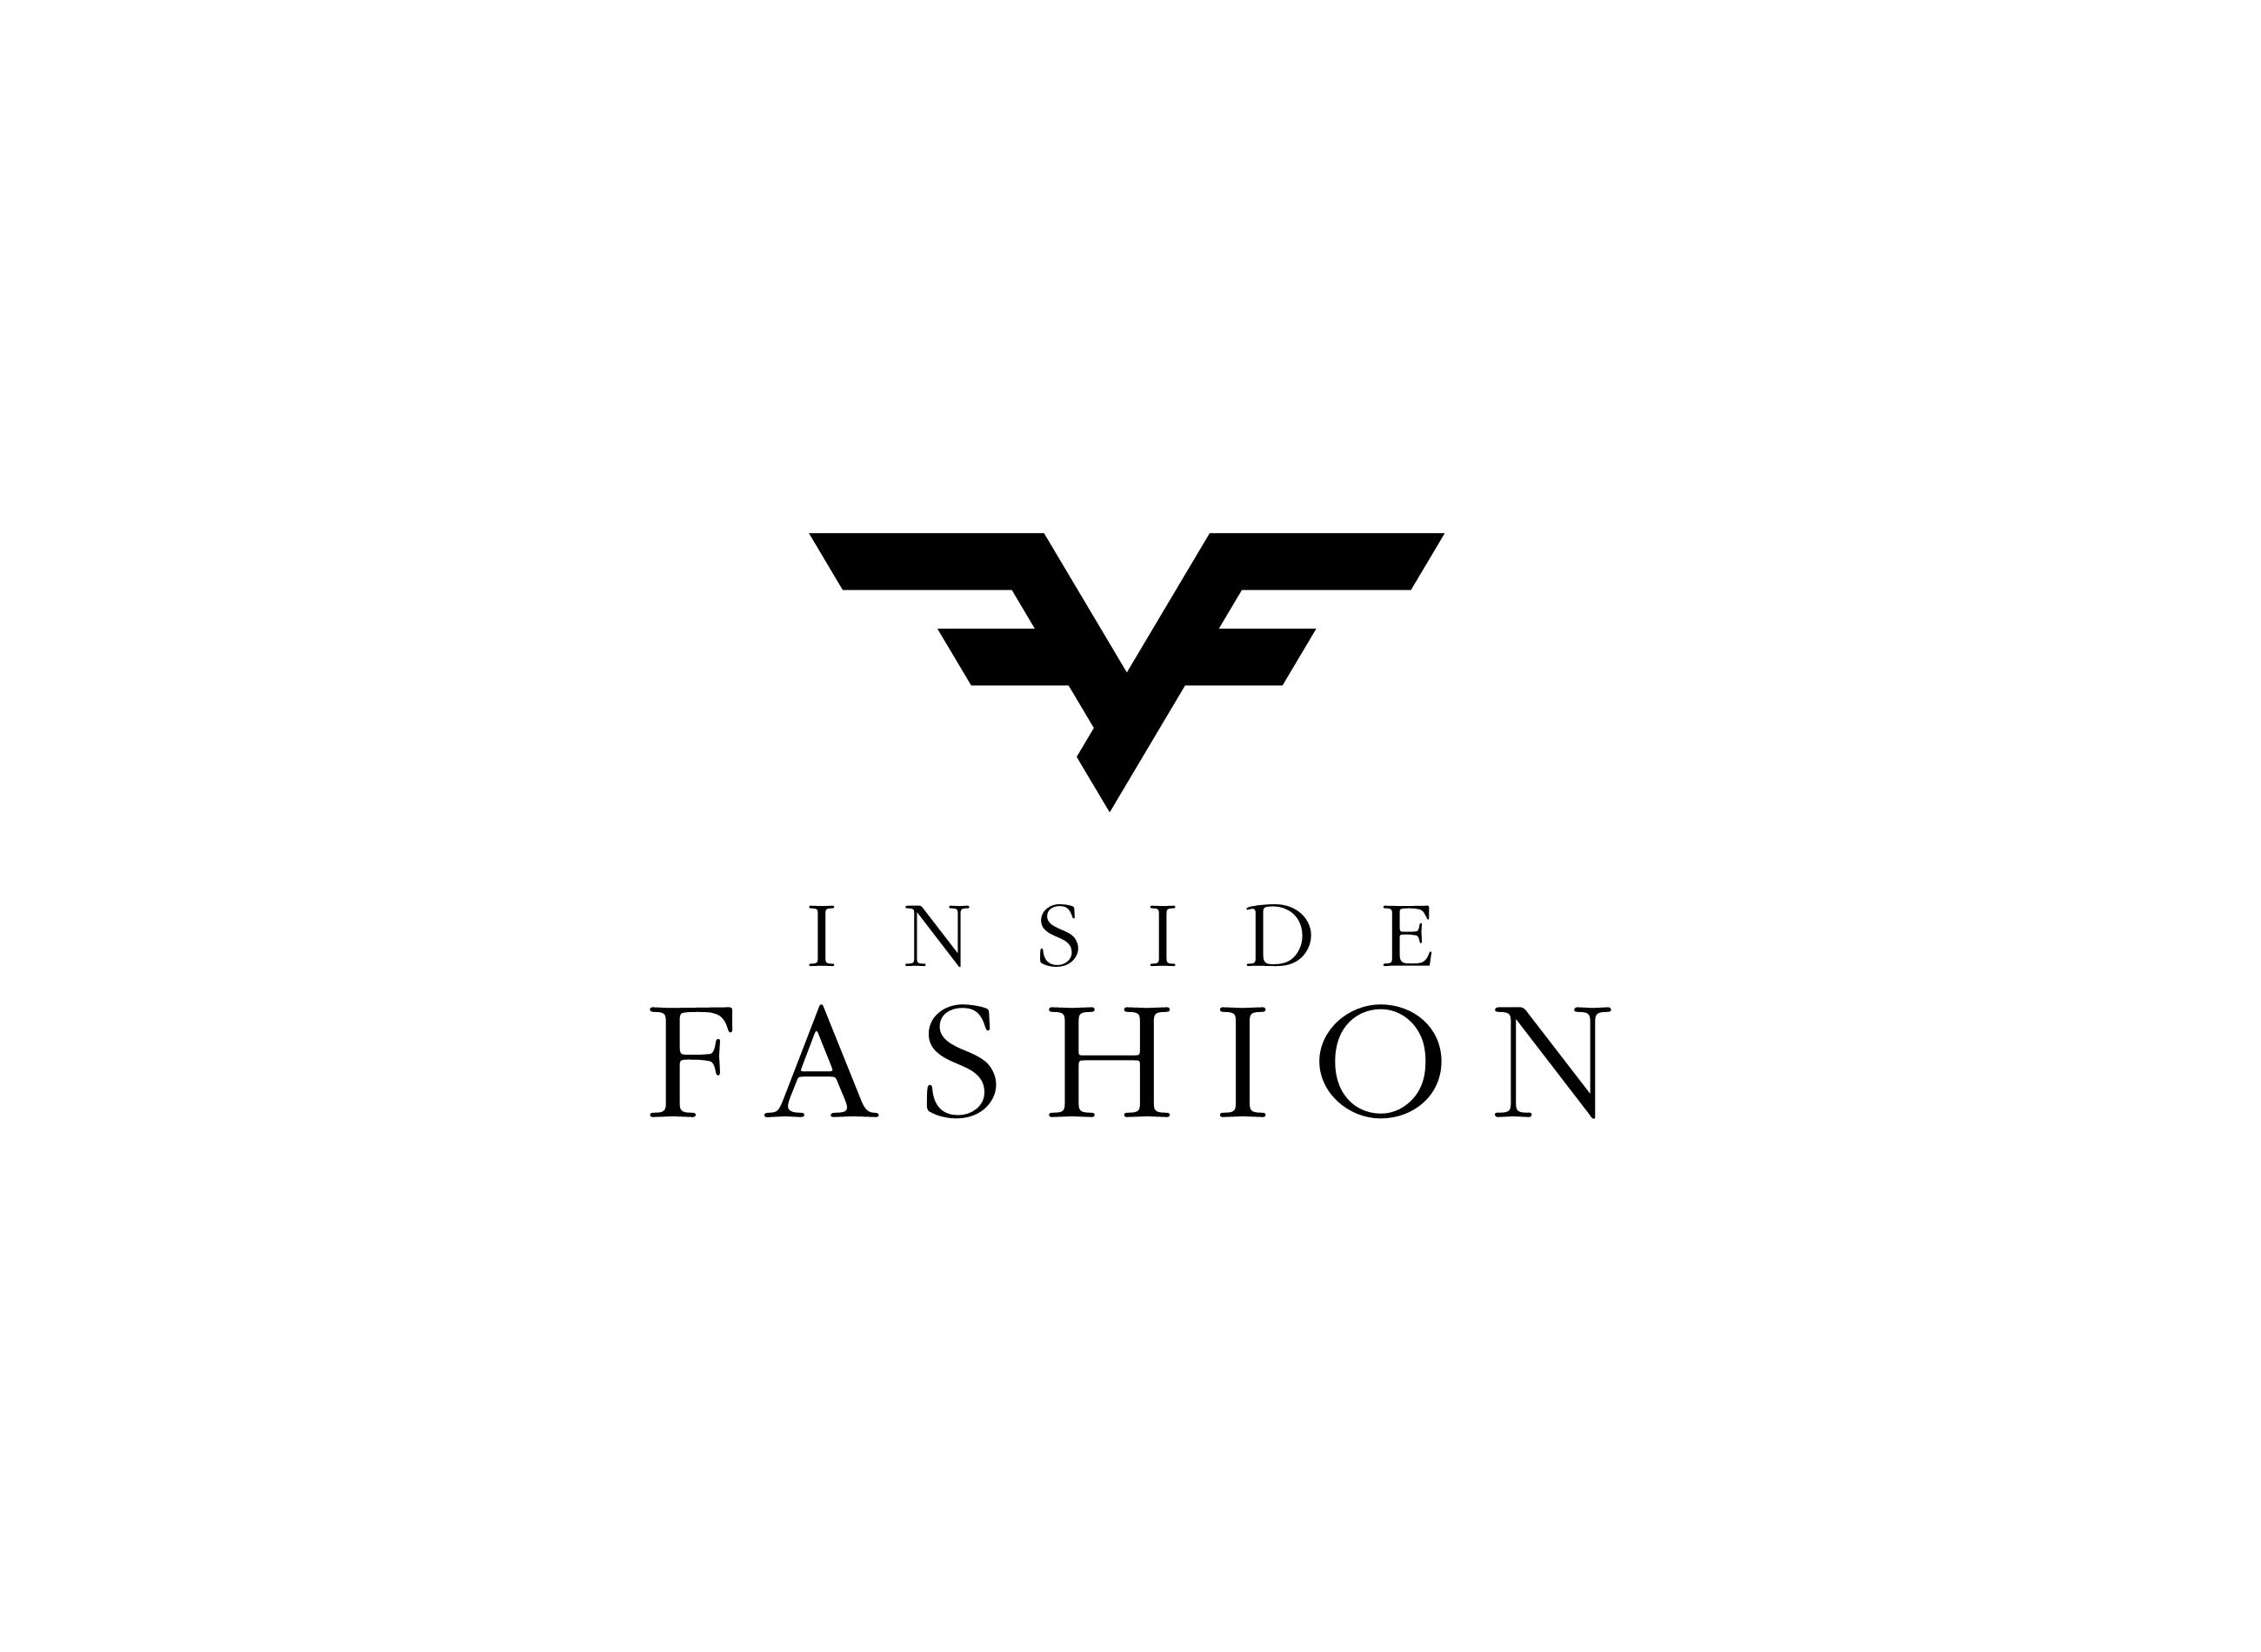 Fashion Logo - Nicoh.net